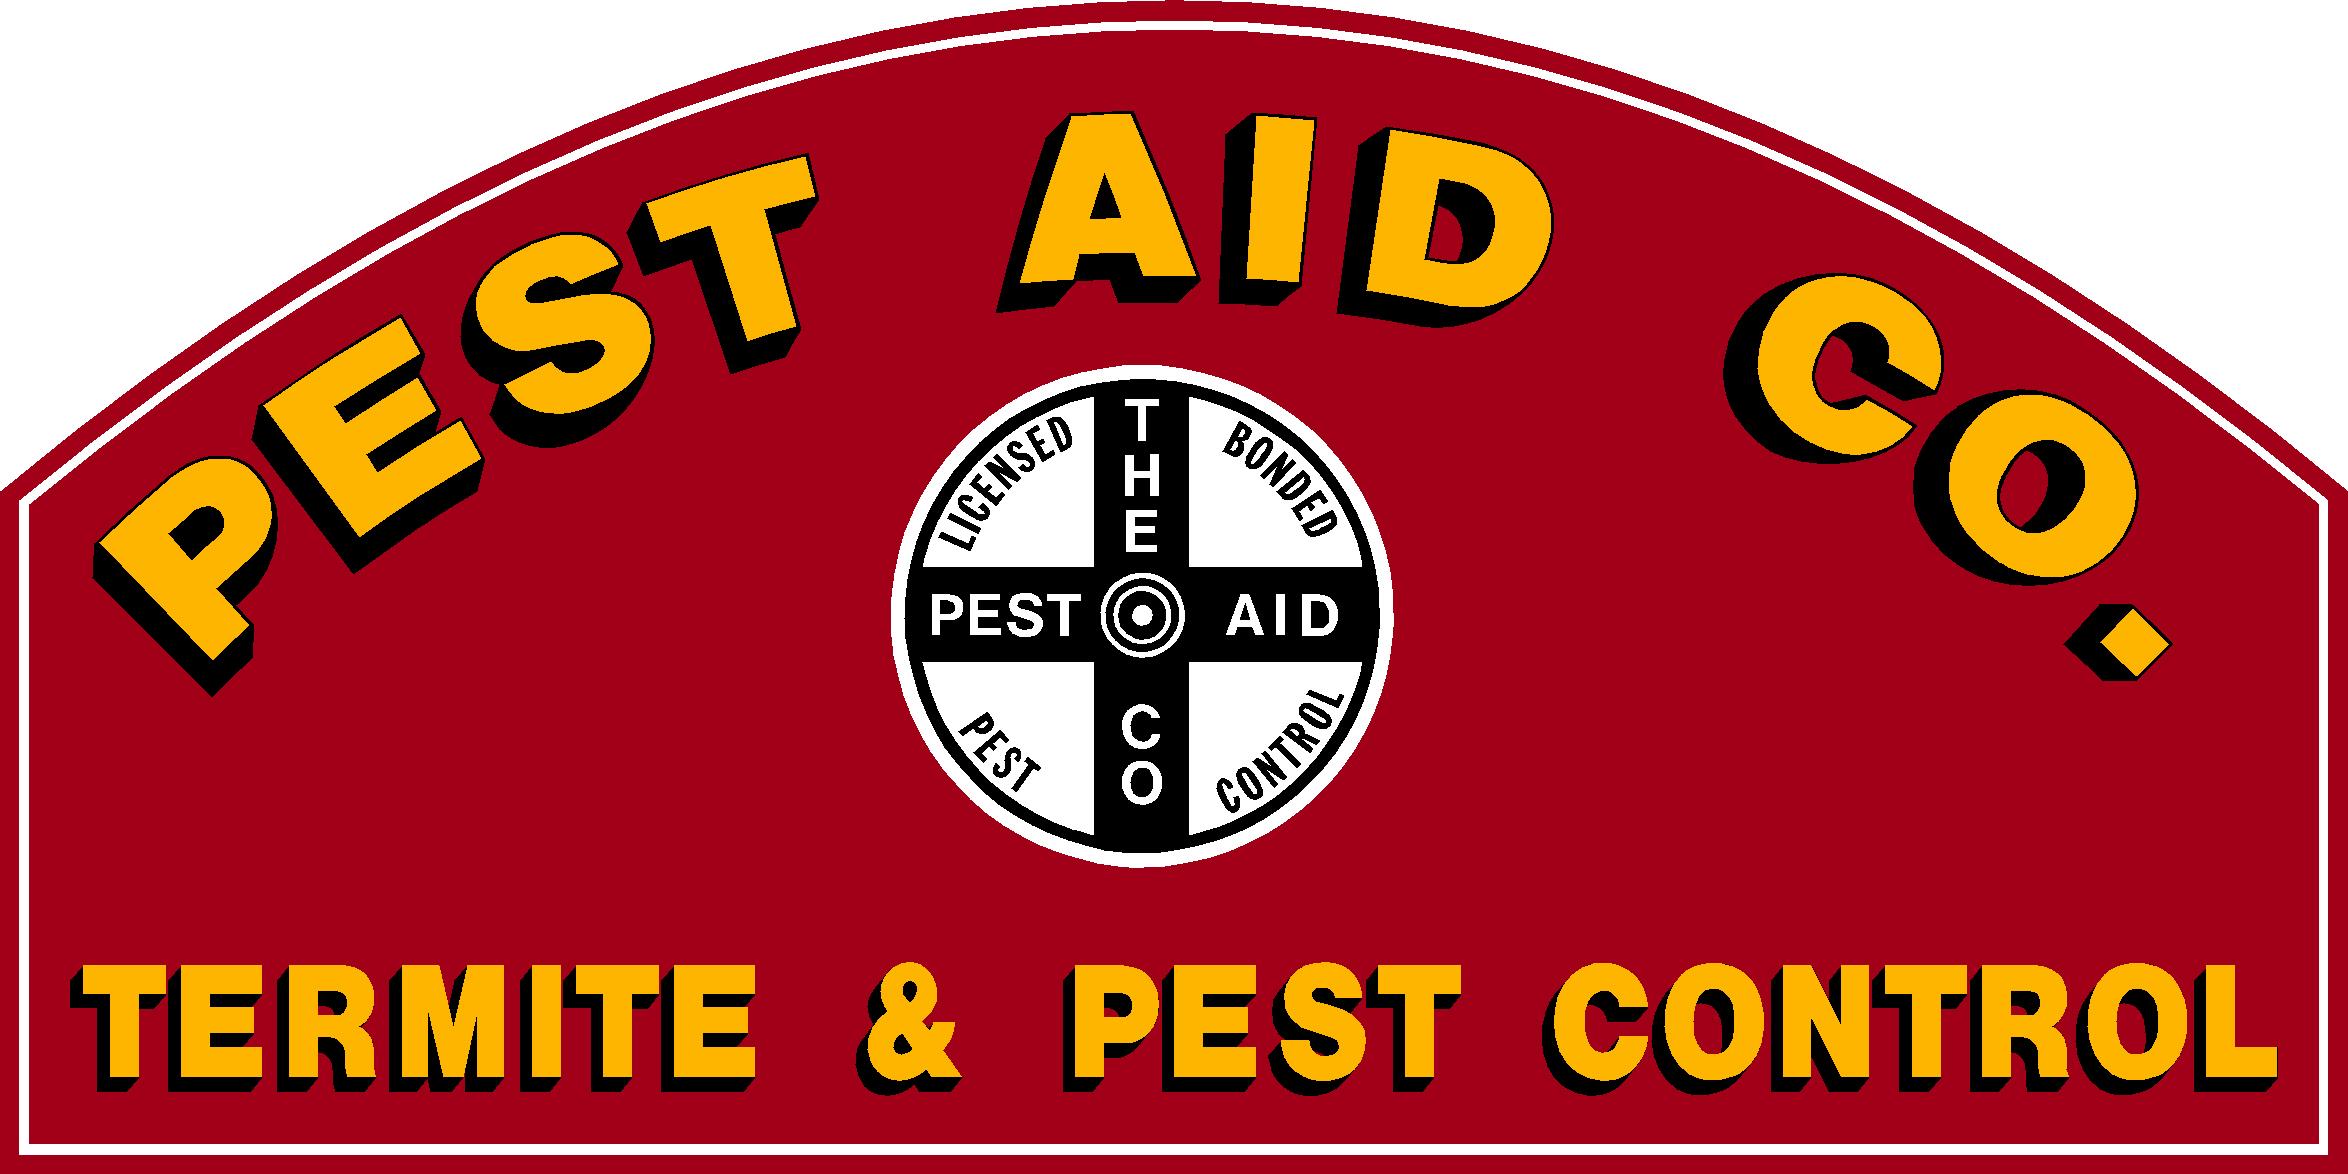 Pest Aid Co